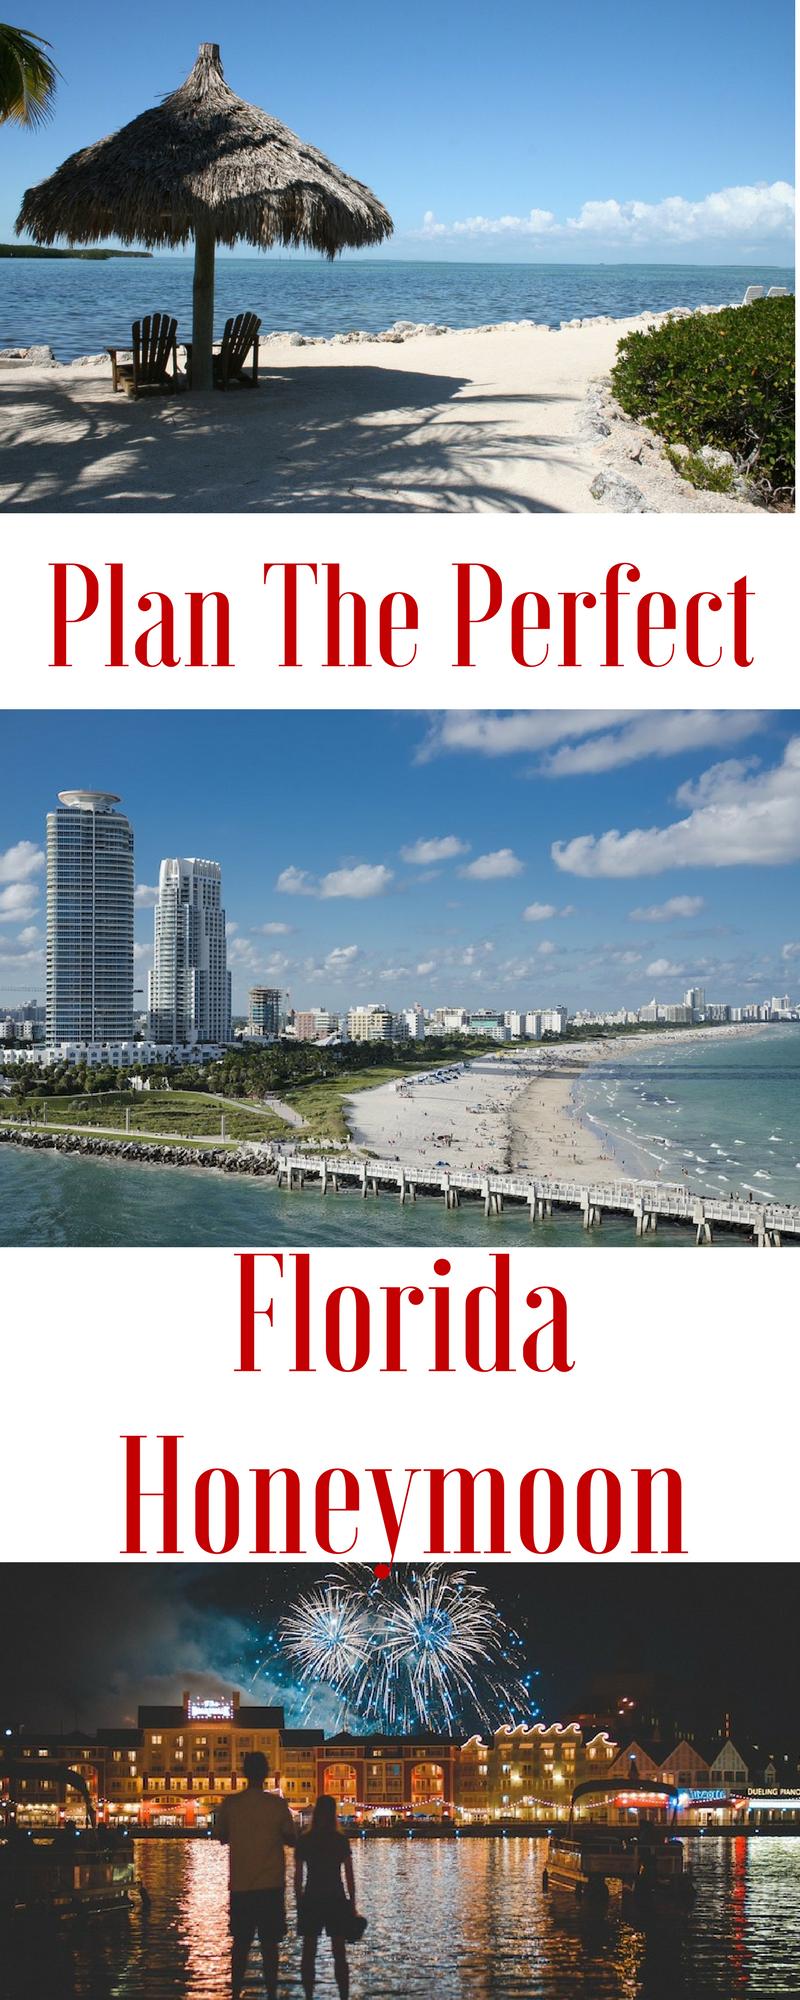 Honeymoon In Florida Resorts Attactions Beaches Tip More Florida Honeymoon Us Honeymoon Destinations Honeymoon Travel